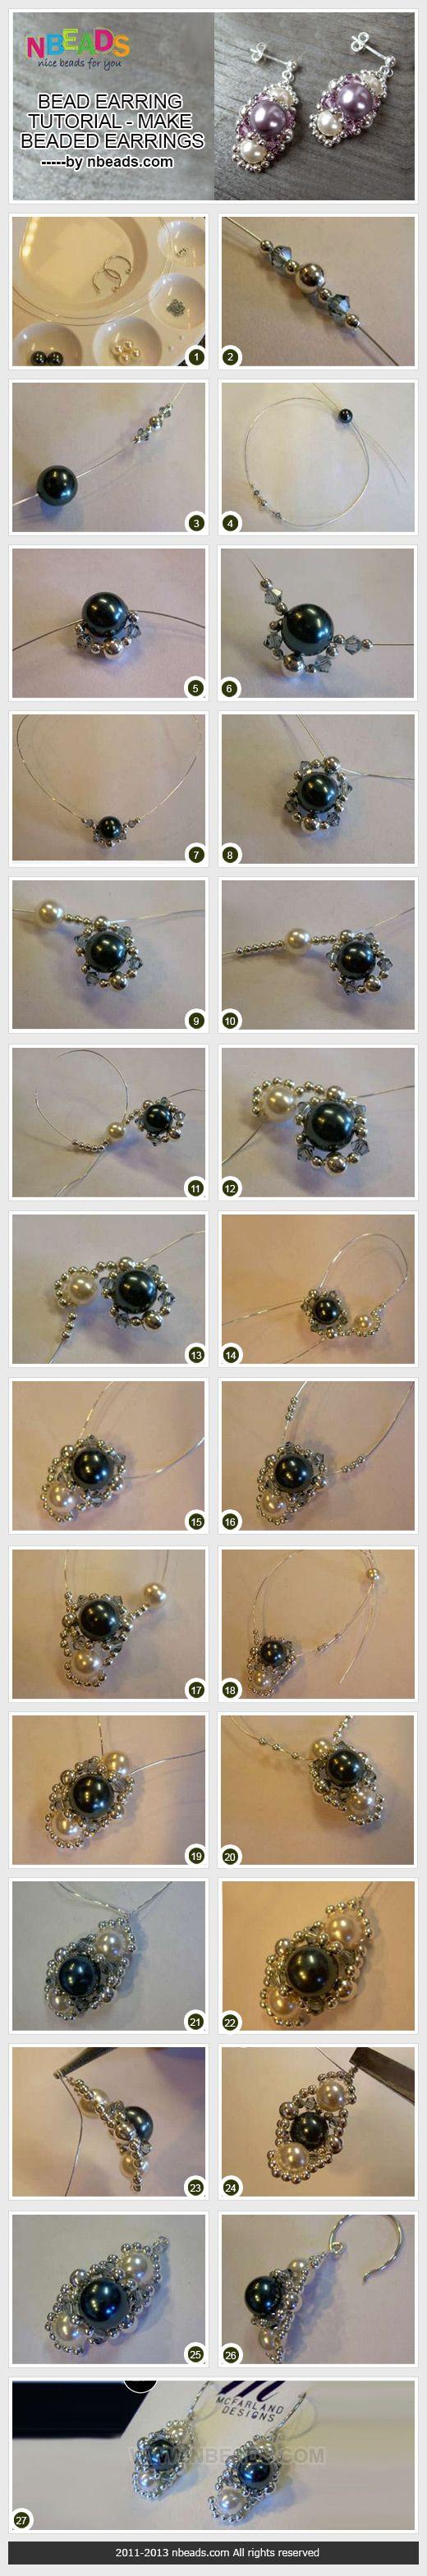 bead earring tutorial - make beaded earrings